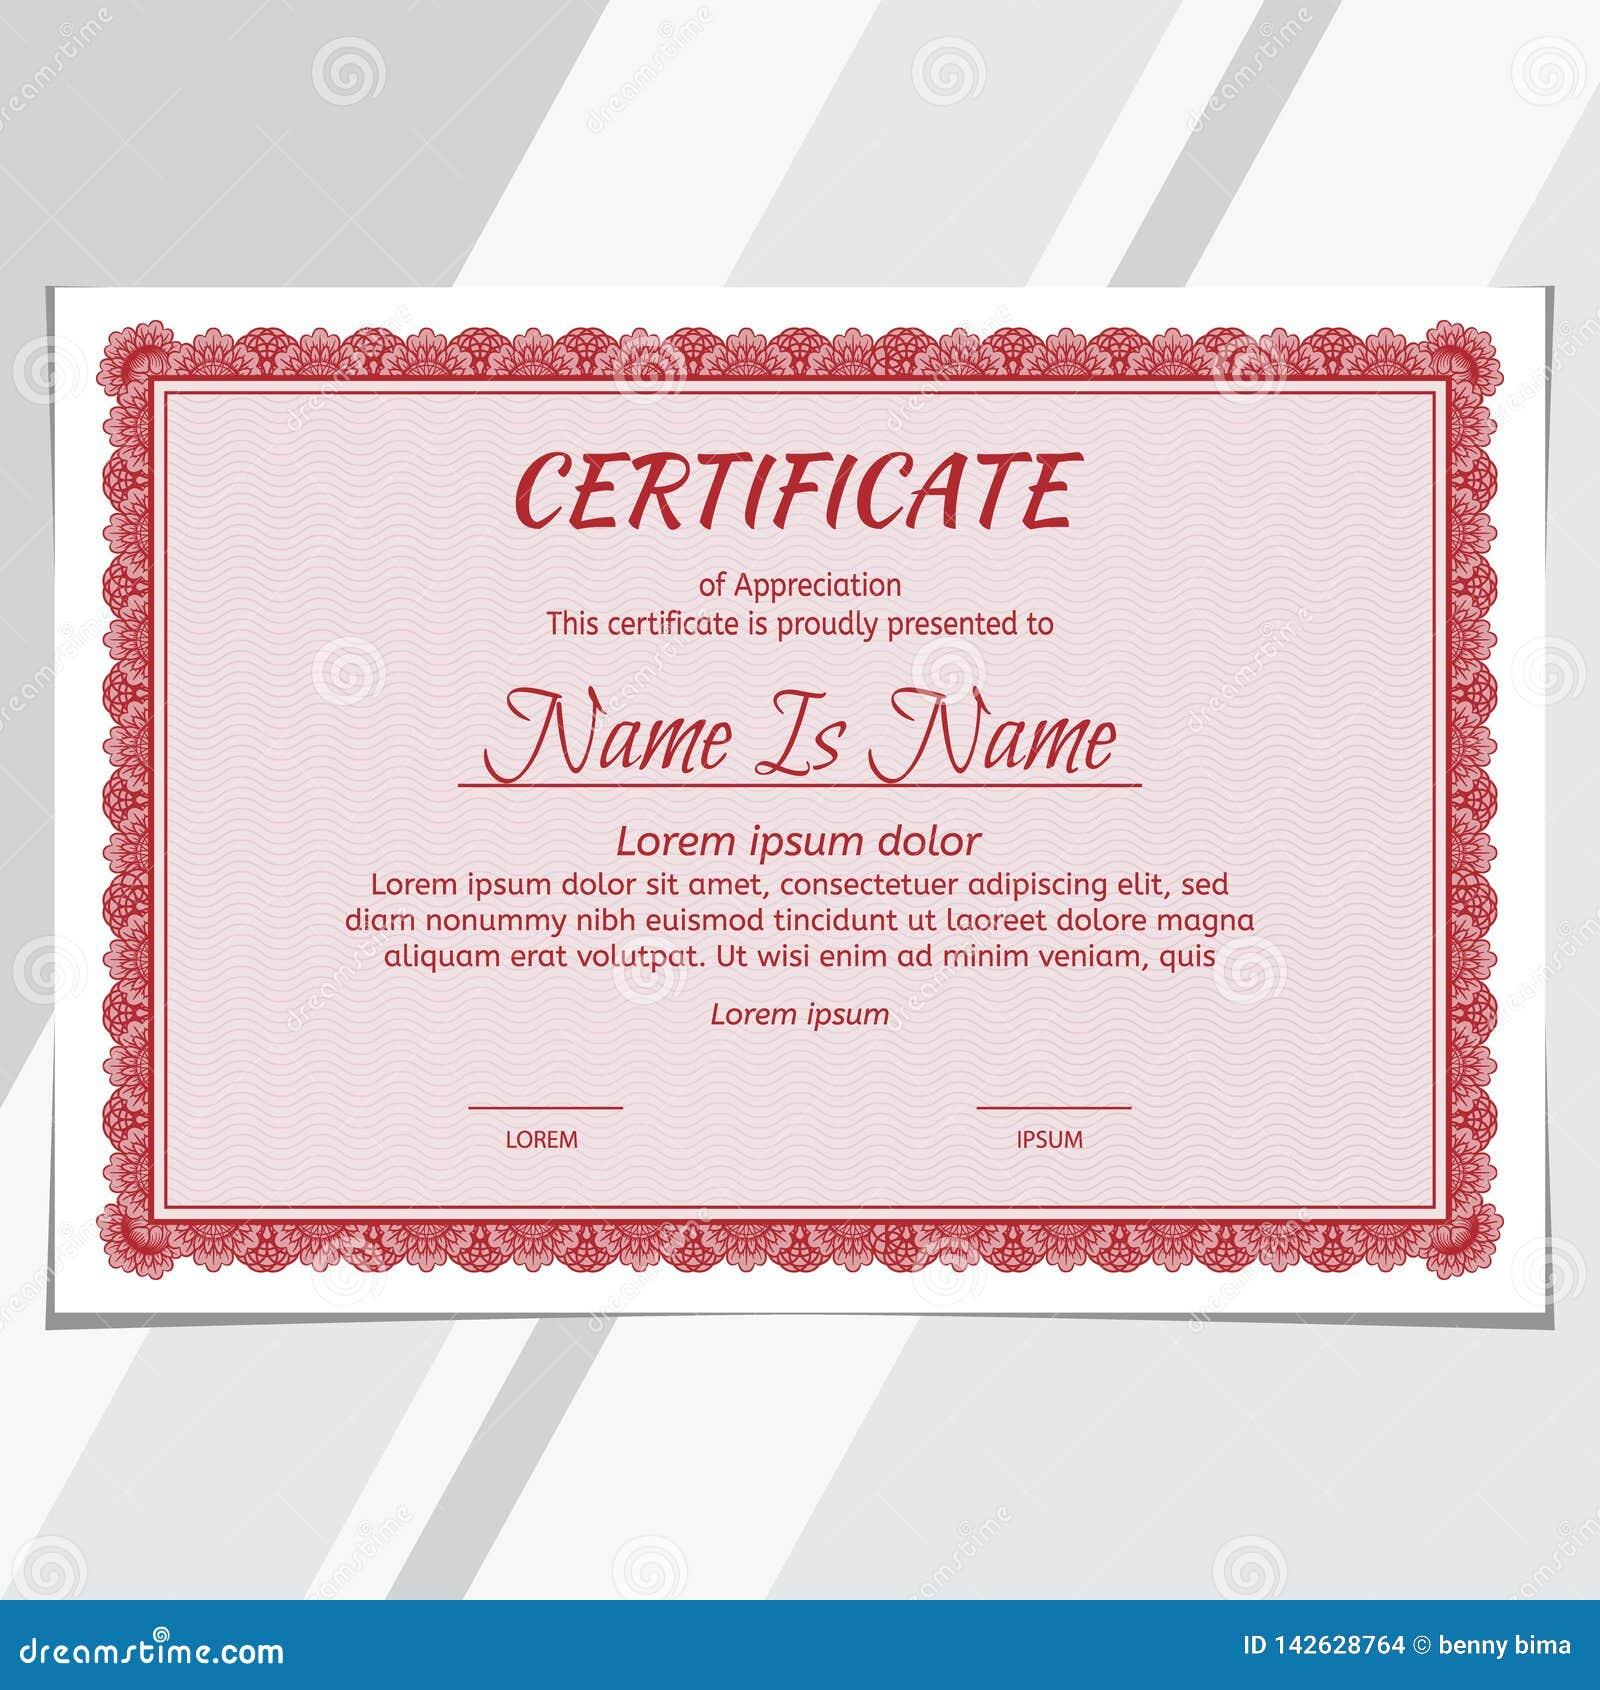 Certificate Diploma Landscape Stock Vector - Illustration ...